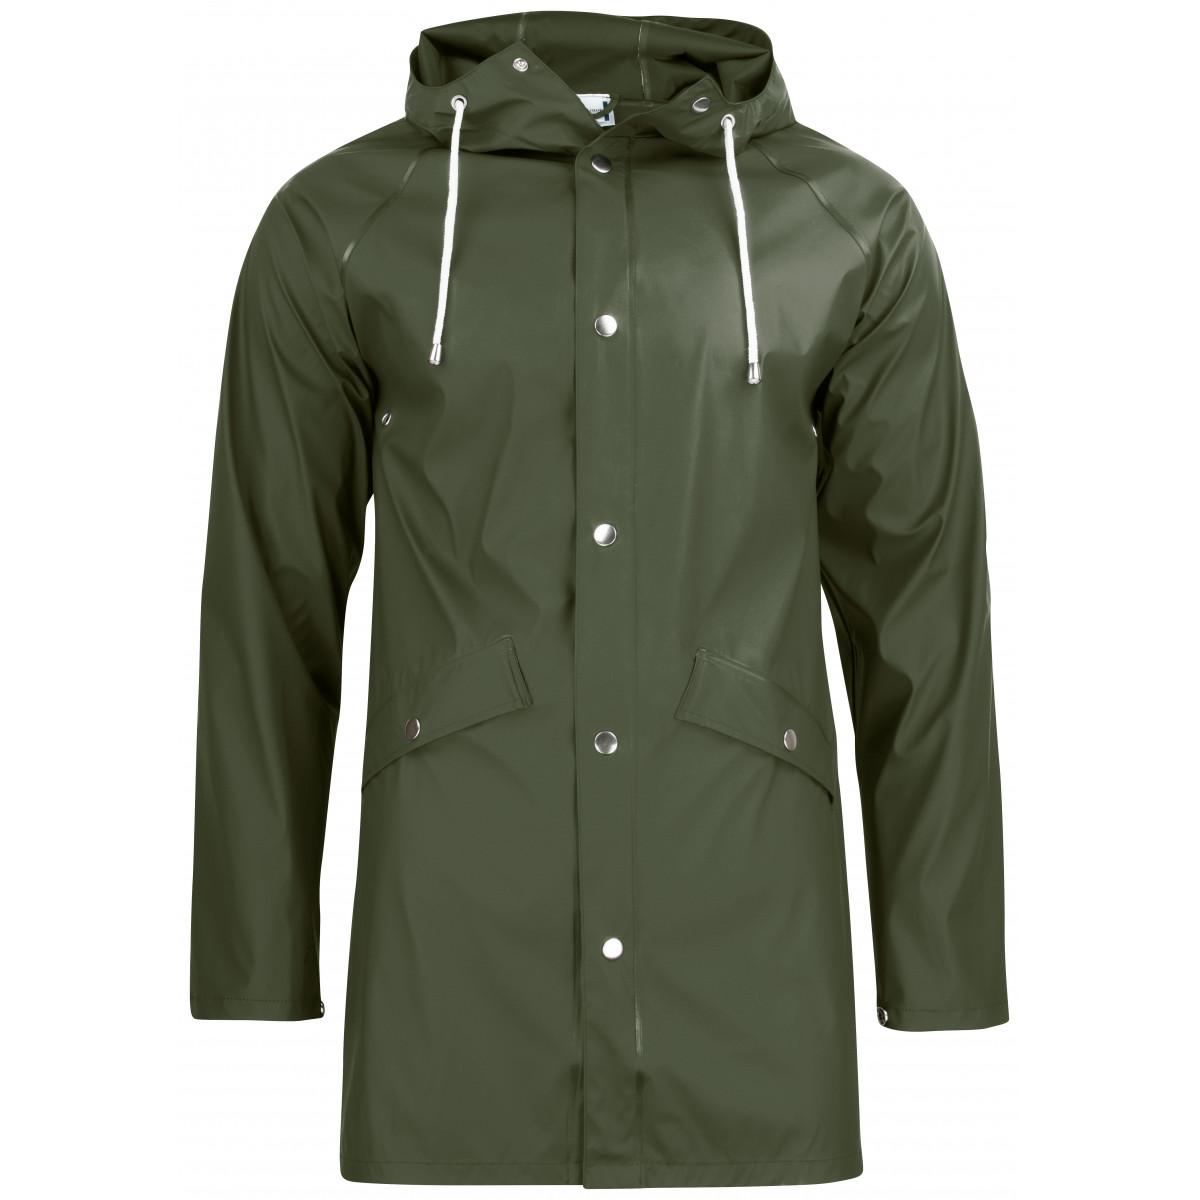 Дождевик унисекс 020939 Classic Rain Jacket - Охотничий зеленый